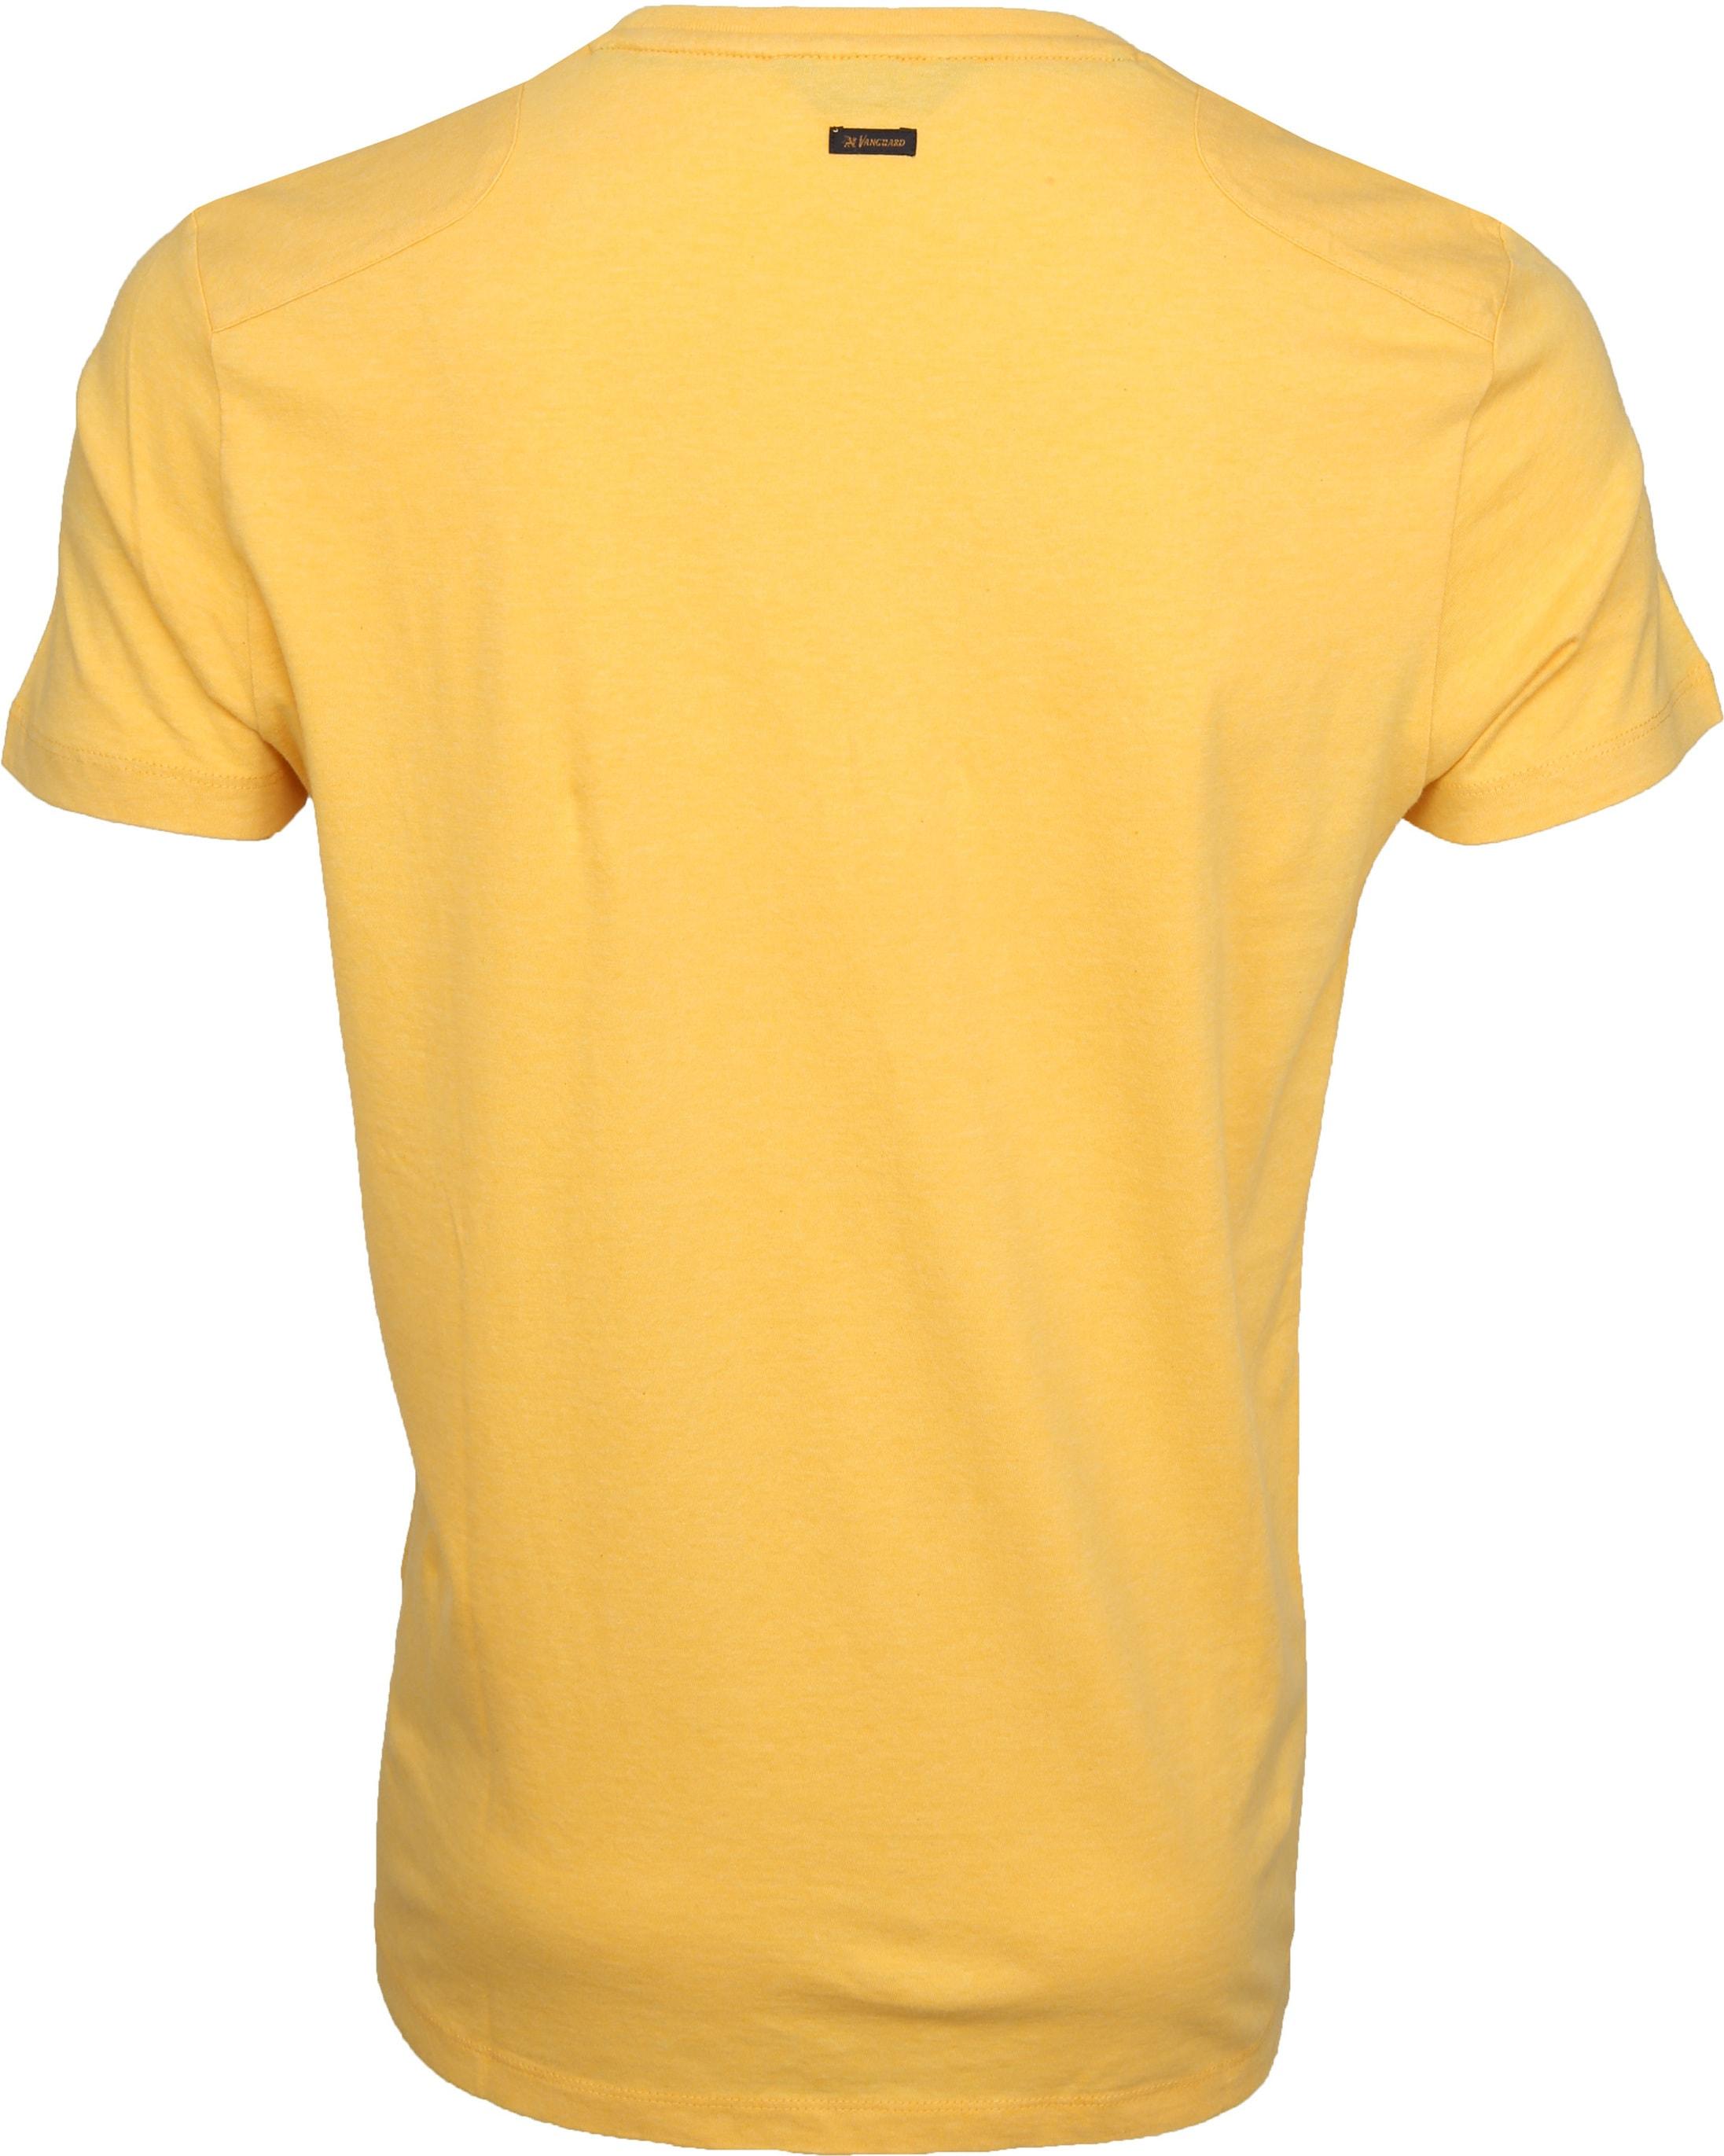 Vanguard T-shirt Print Samoan Sun Geel foto 2